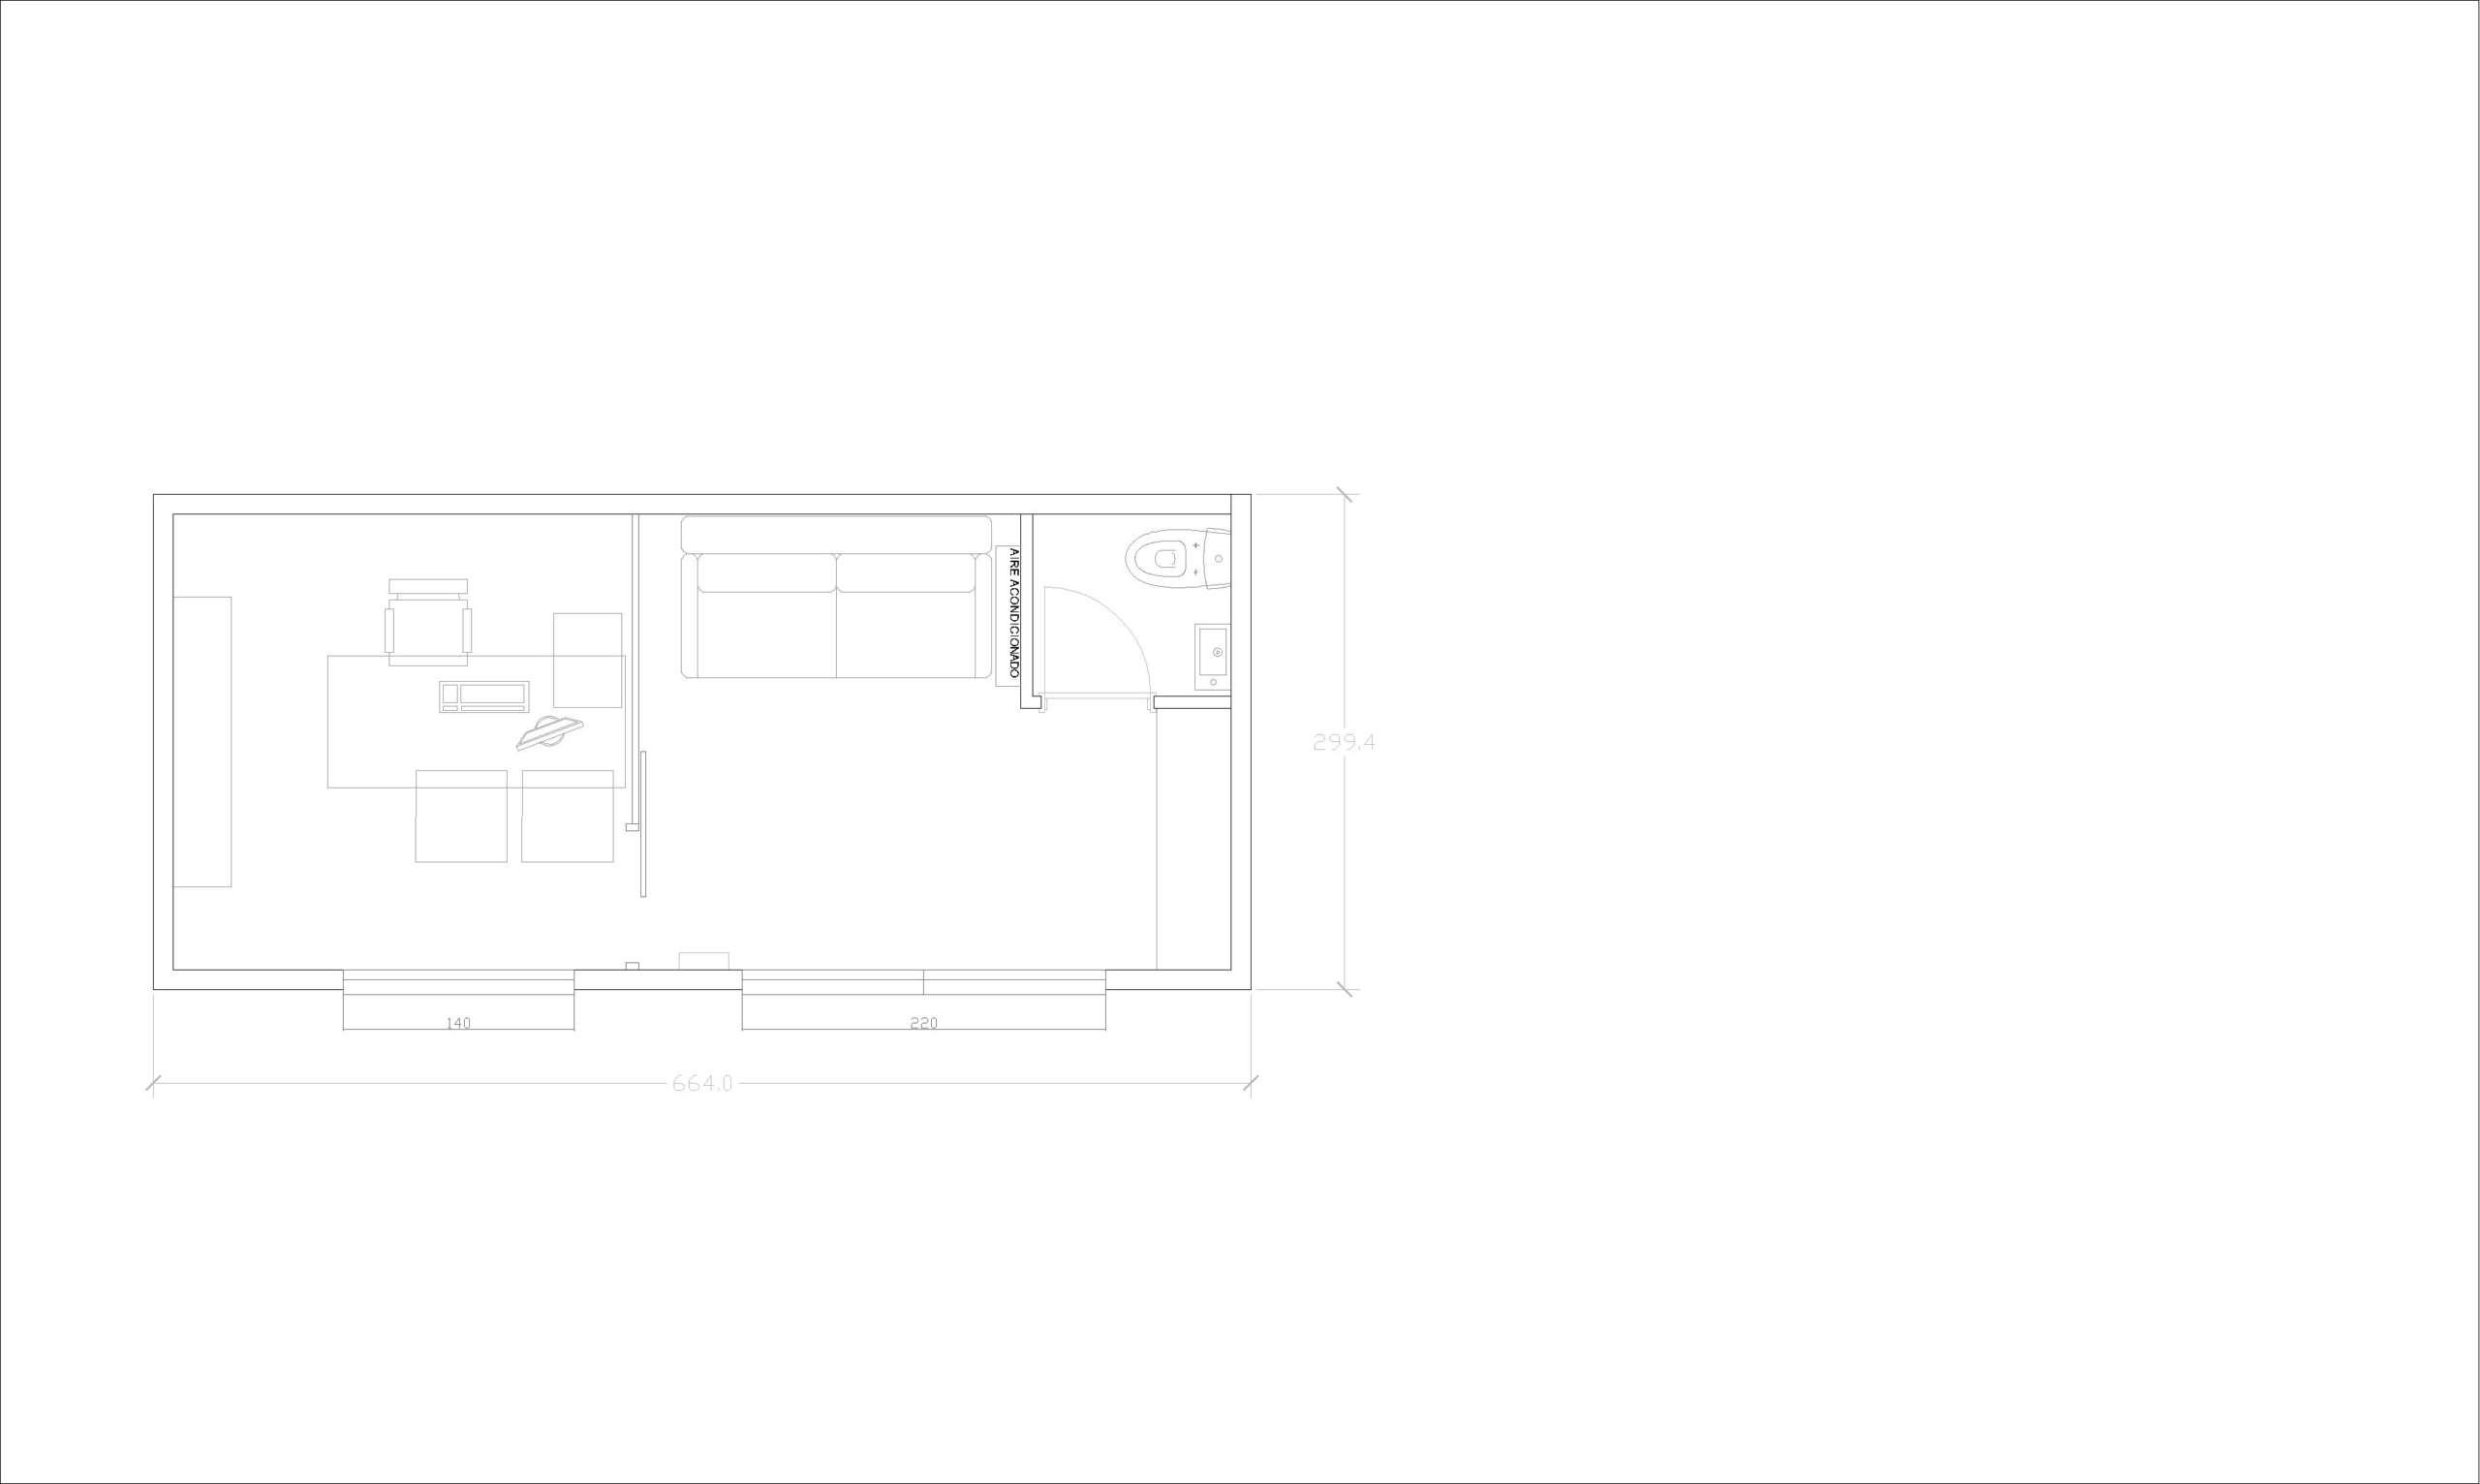 Plano minicasa oficina